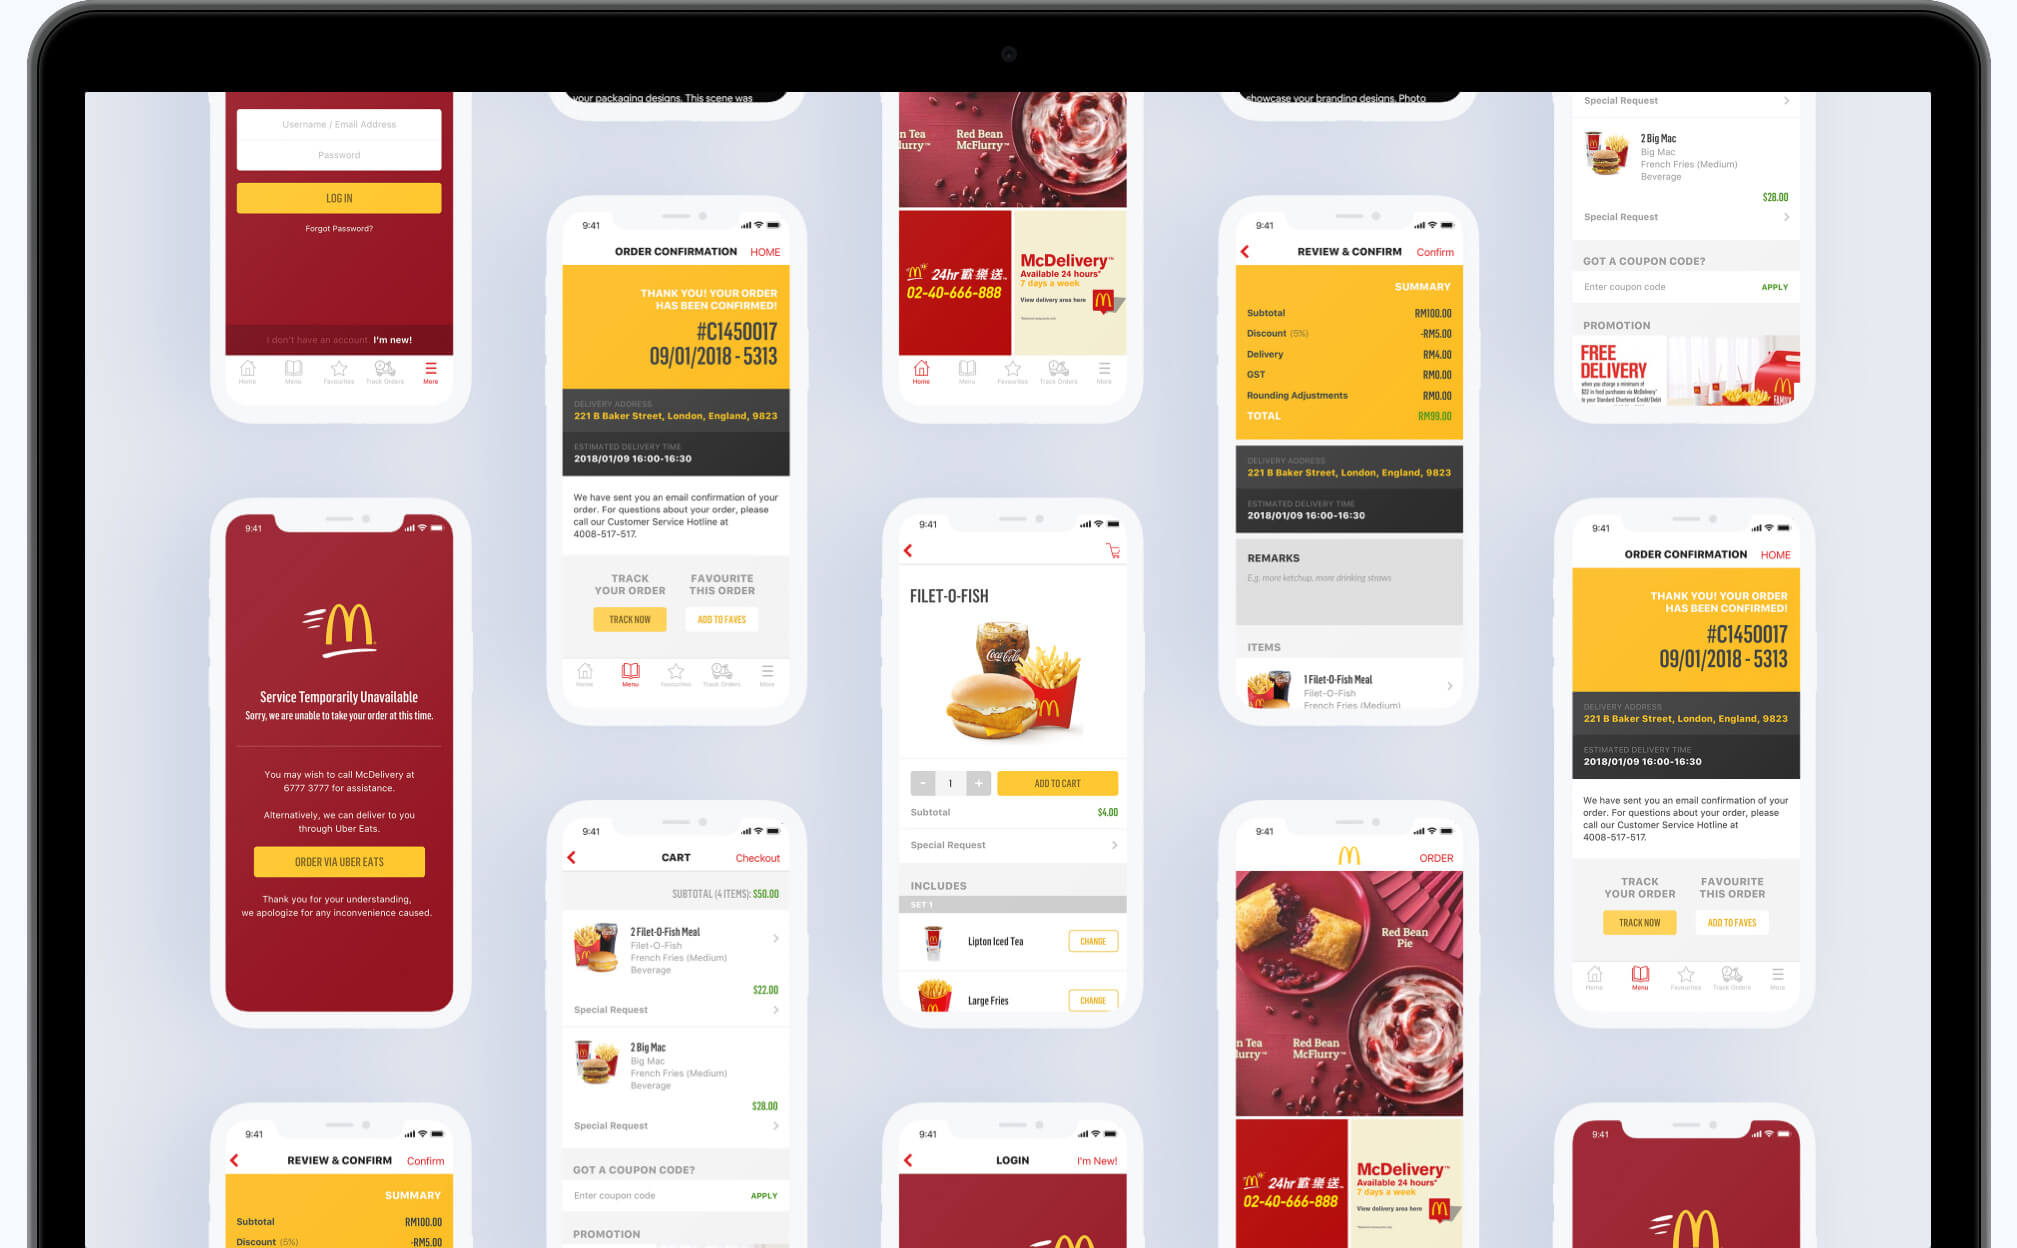 McDonalds app screens on a laptop